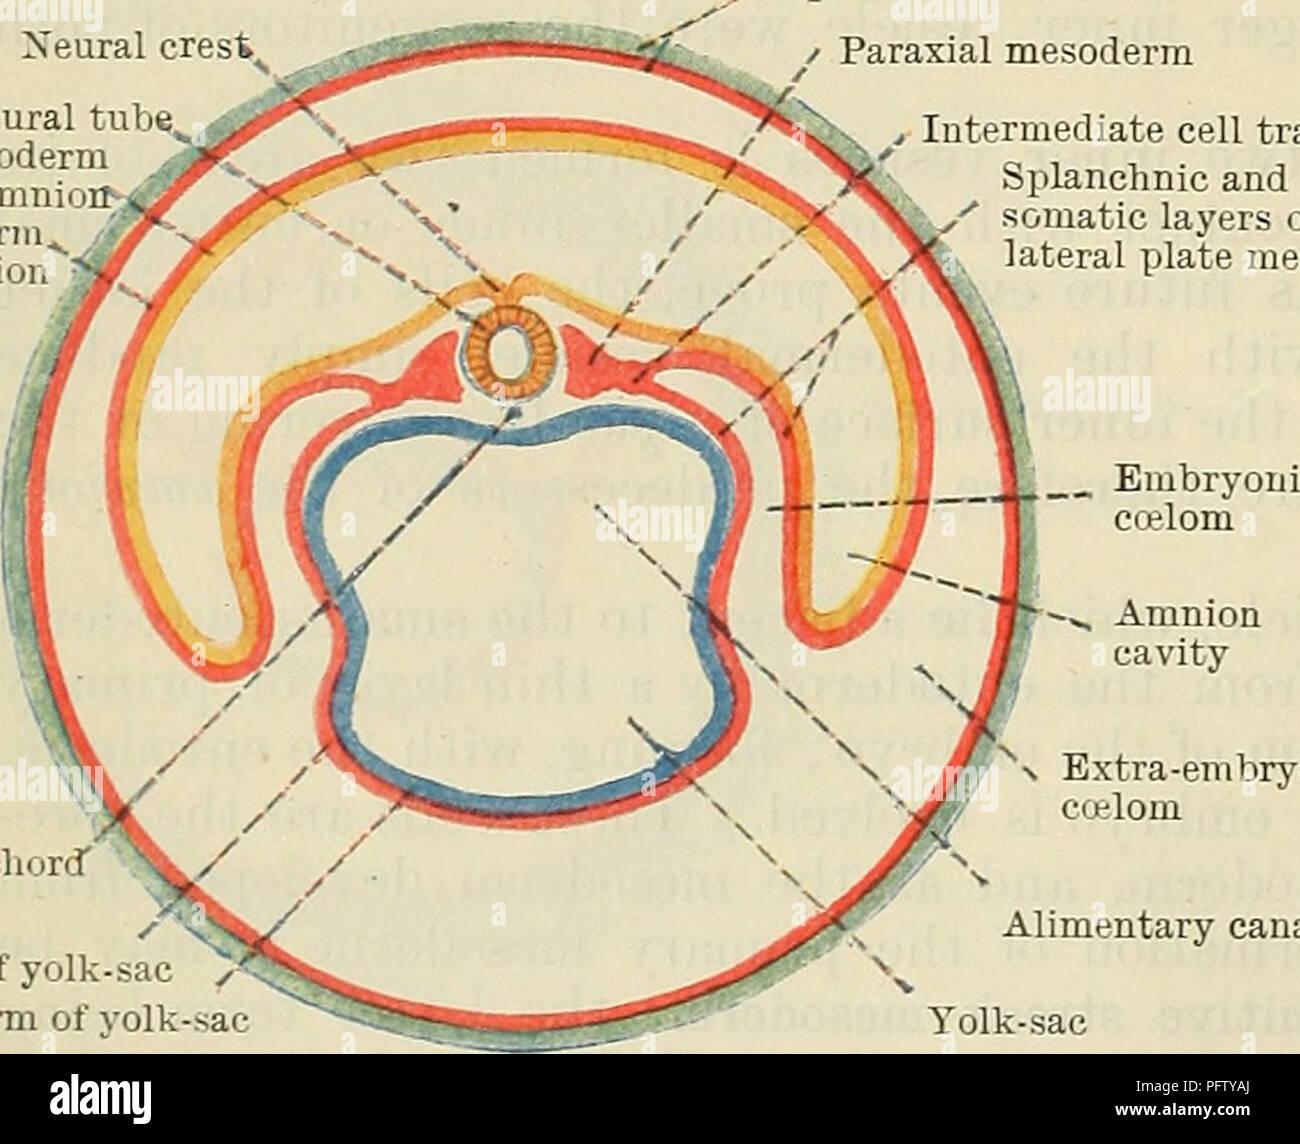 Cunningham\'s Text-book of anatomy. Anatomy. Trophoblast of chorion ...